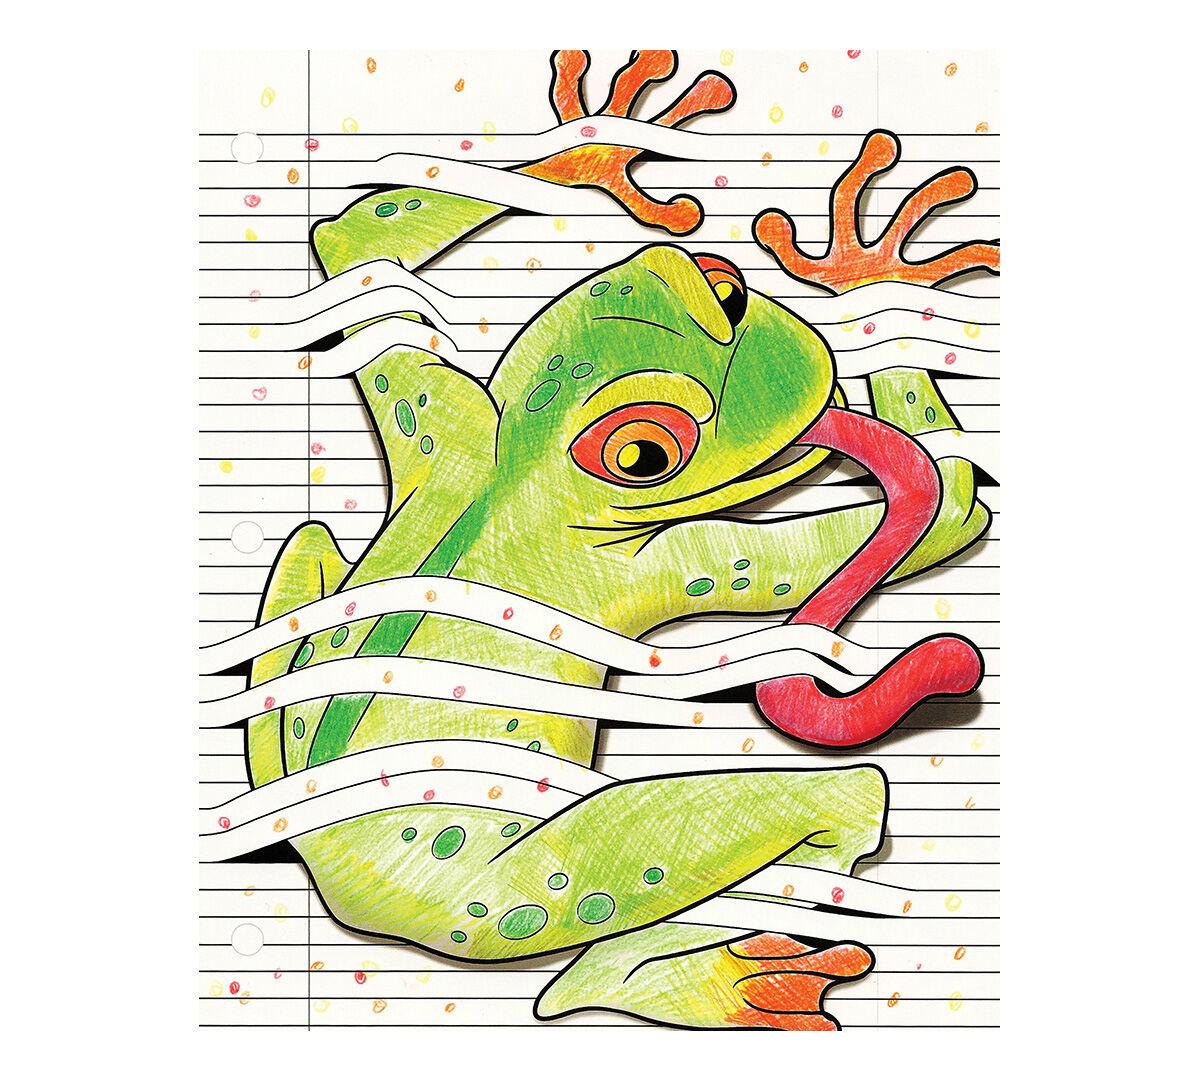 Crayola Art With Edge Optical Illusions 40 Aged Up